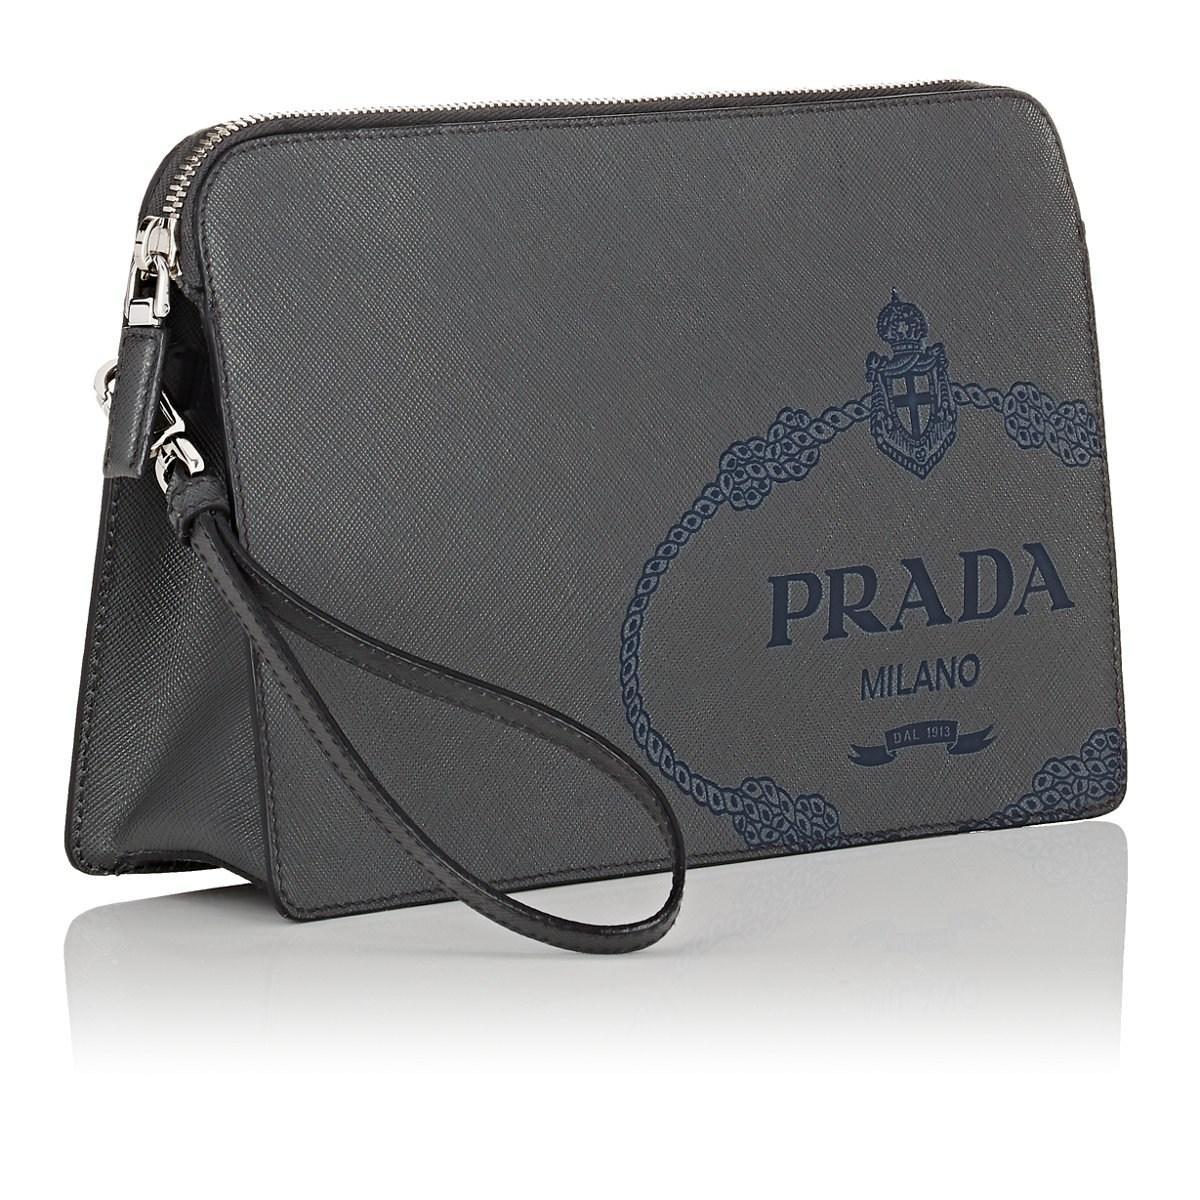 a3d82f1b5fd7 Prada - Black Leather Pouch for Men - Lyst. View fullscreen